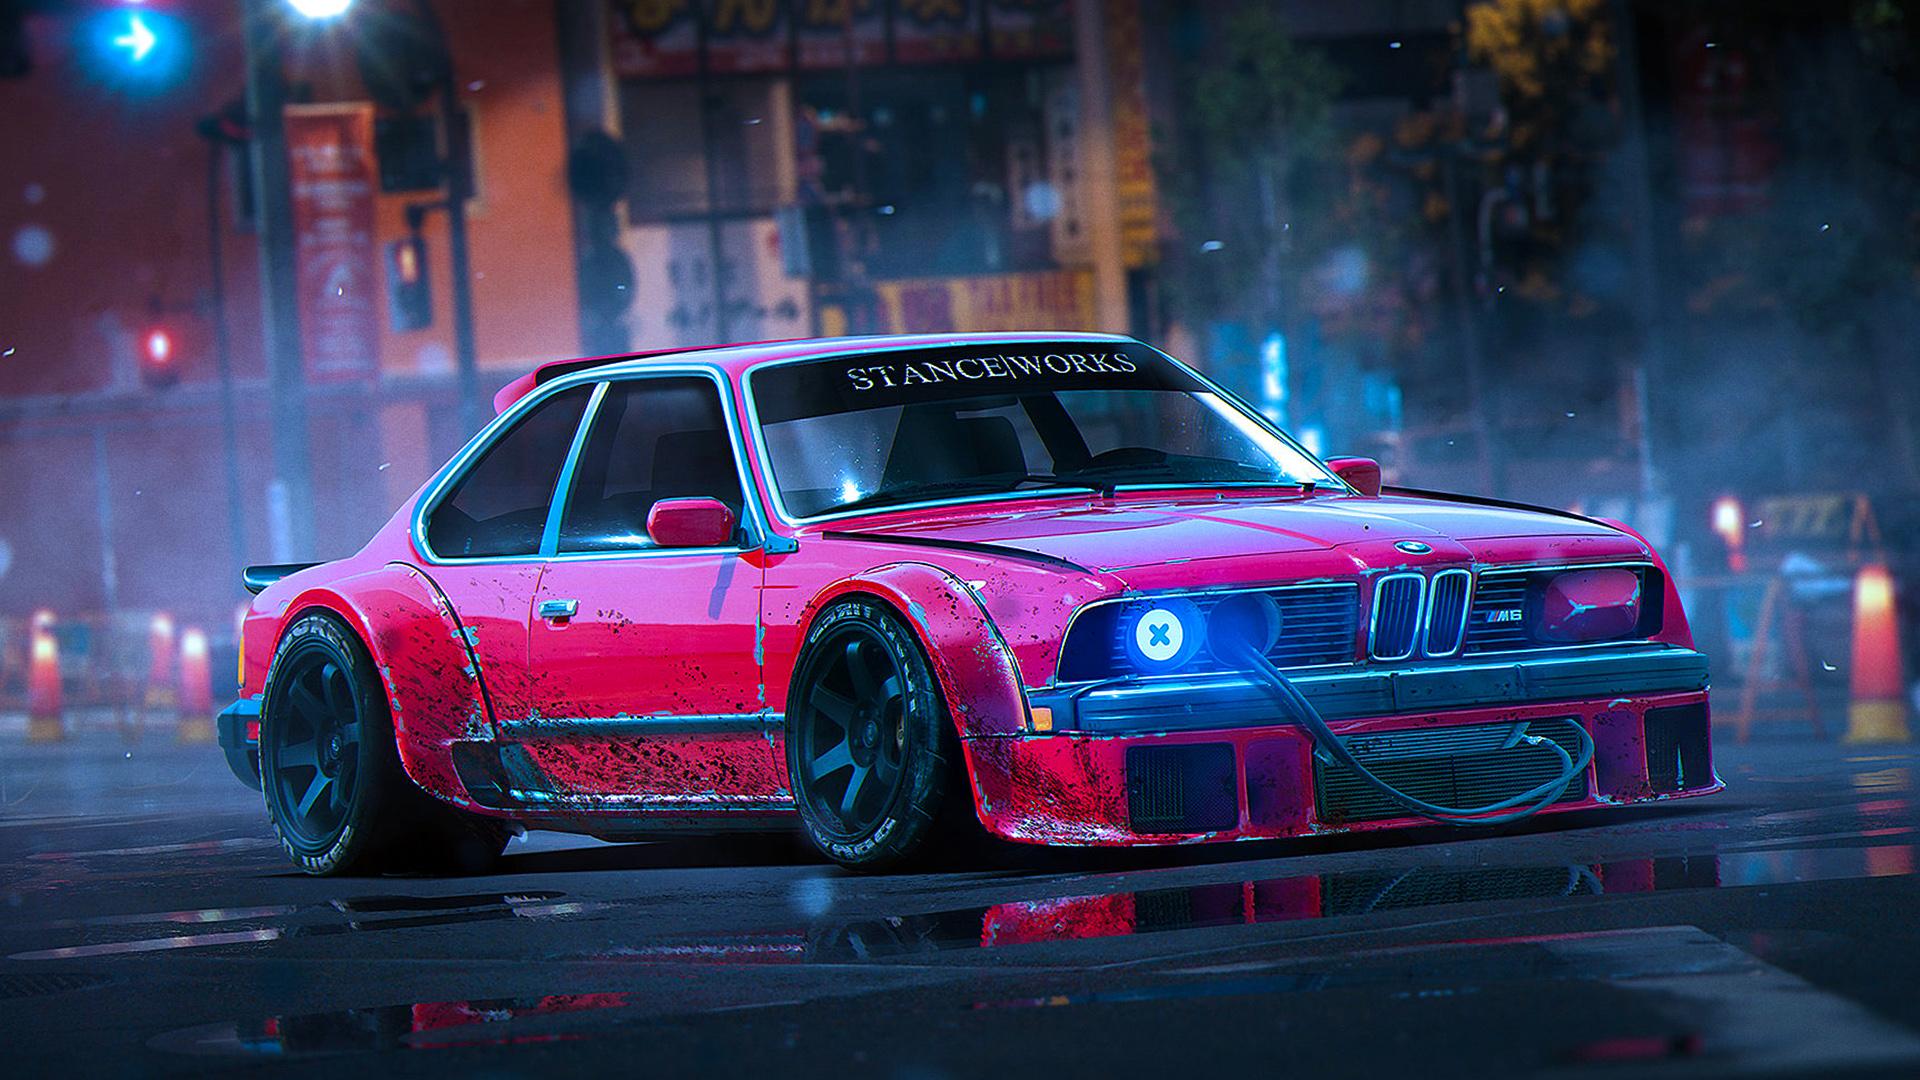 BMW M6 1988 StanceWorks Wallpaper | HD Car Wallpapers | ID ...